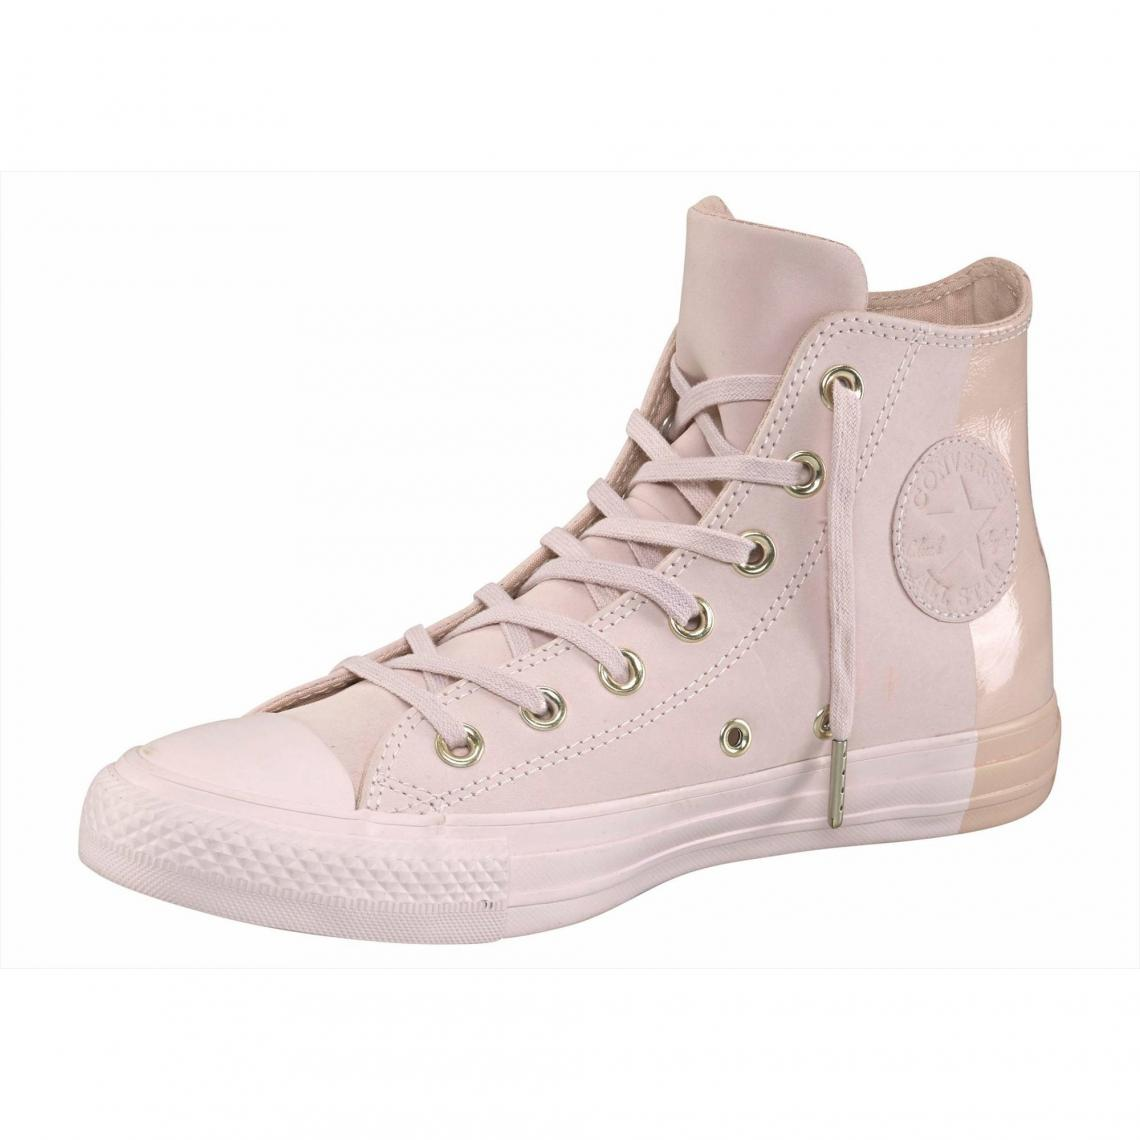 Baskets montantes femme Converse Chuck Taylor All Star Hi Colorblock - Rose  Converse Femme 105bc1508f2